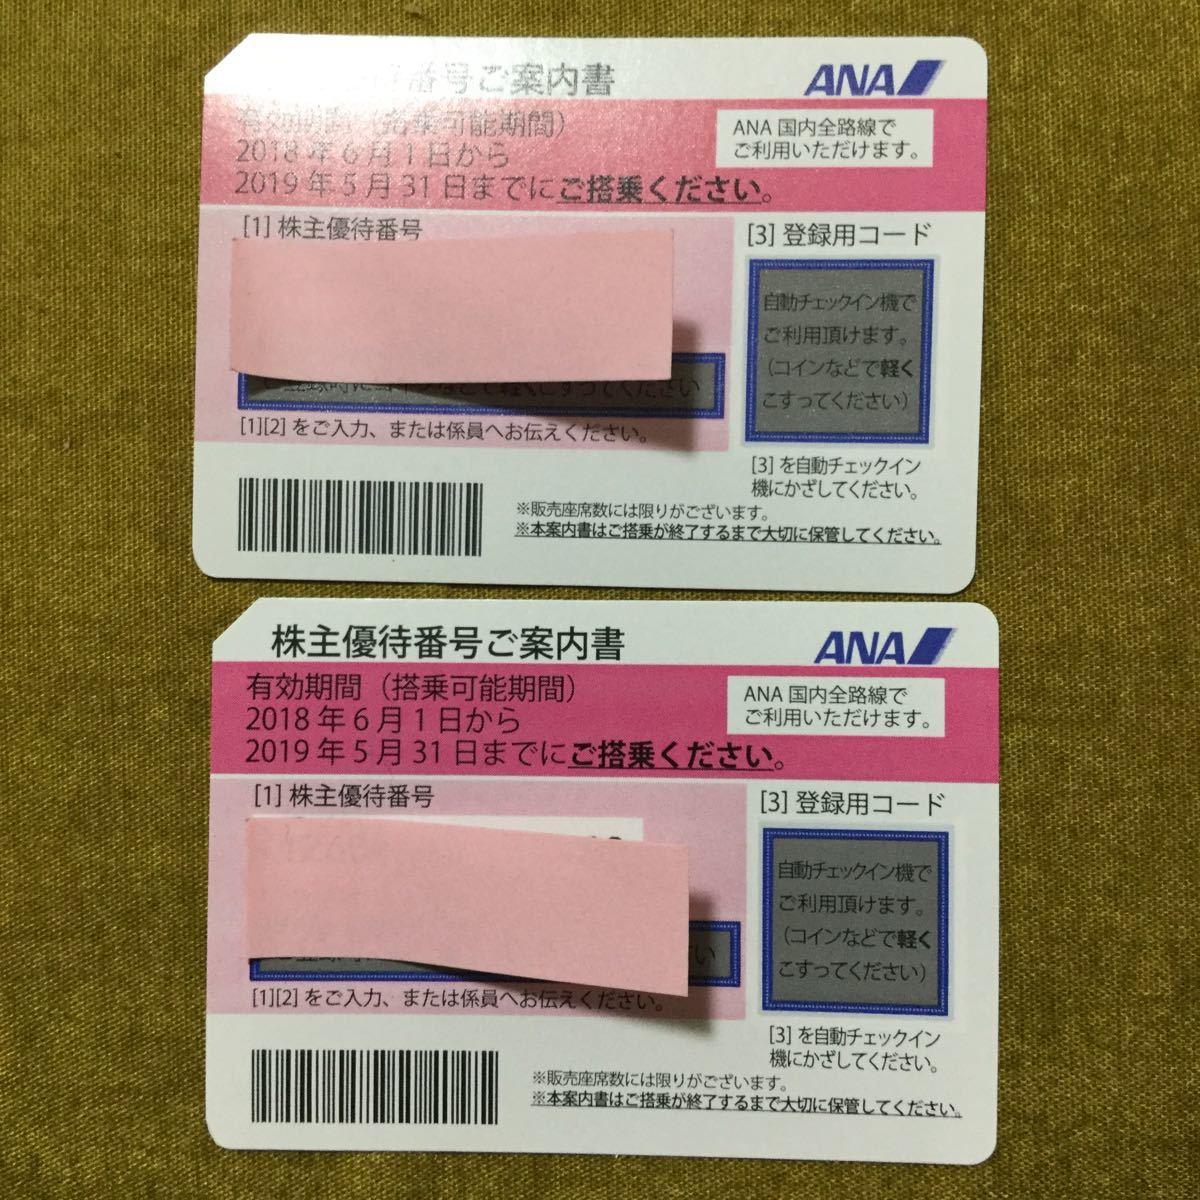 送料無料 ANA株主優待券有効期限2019/5/31 二枚セット